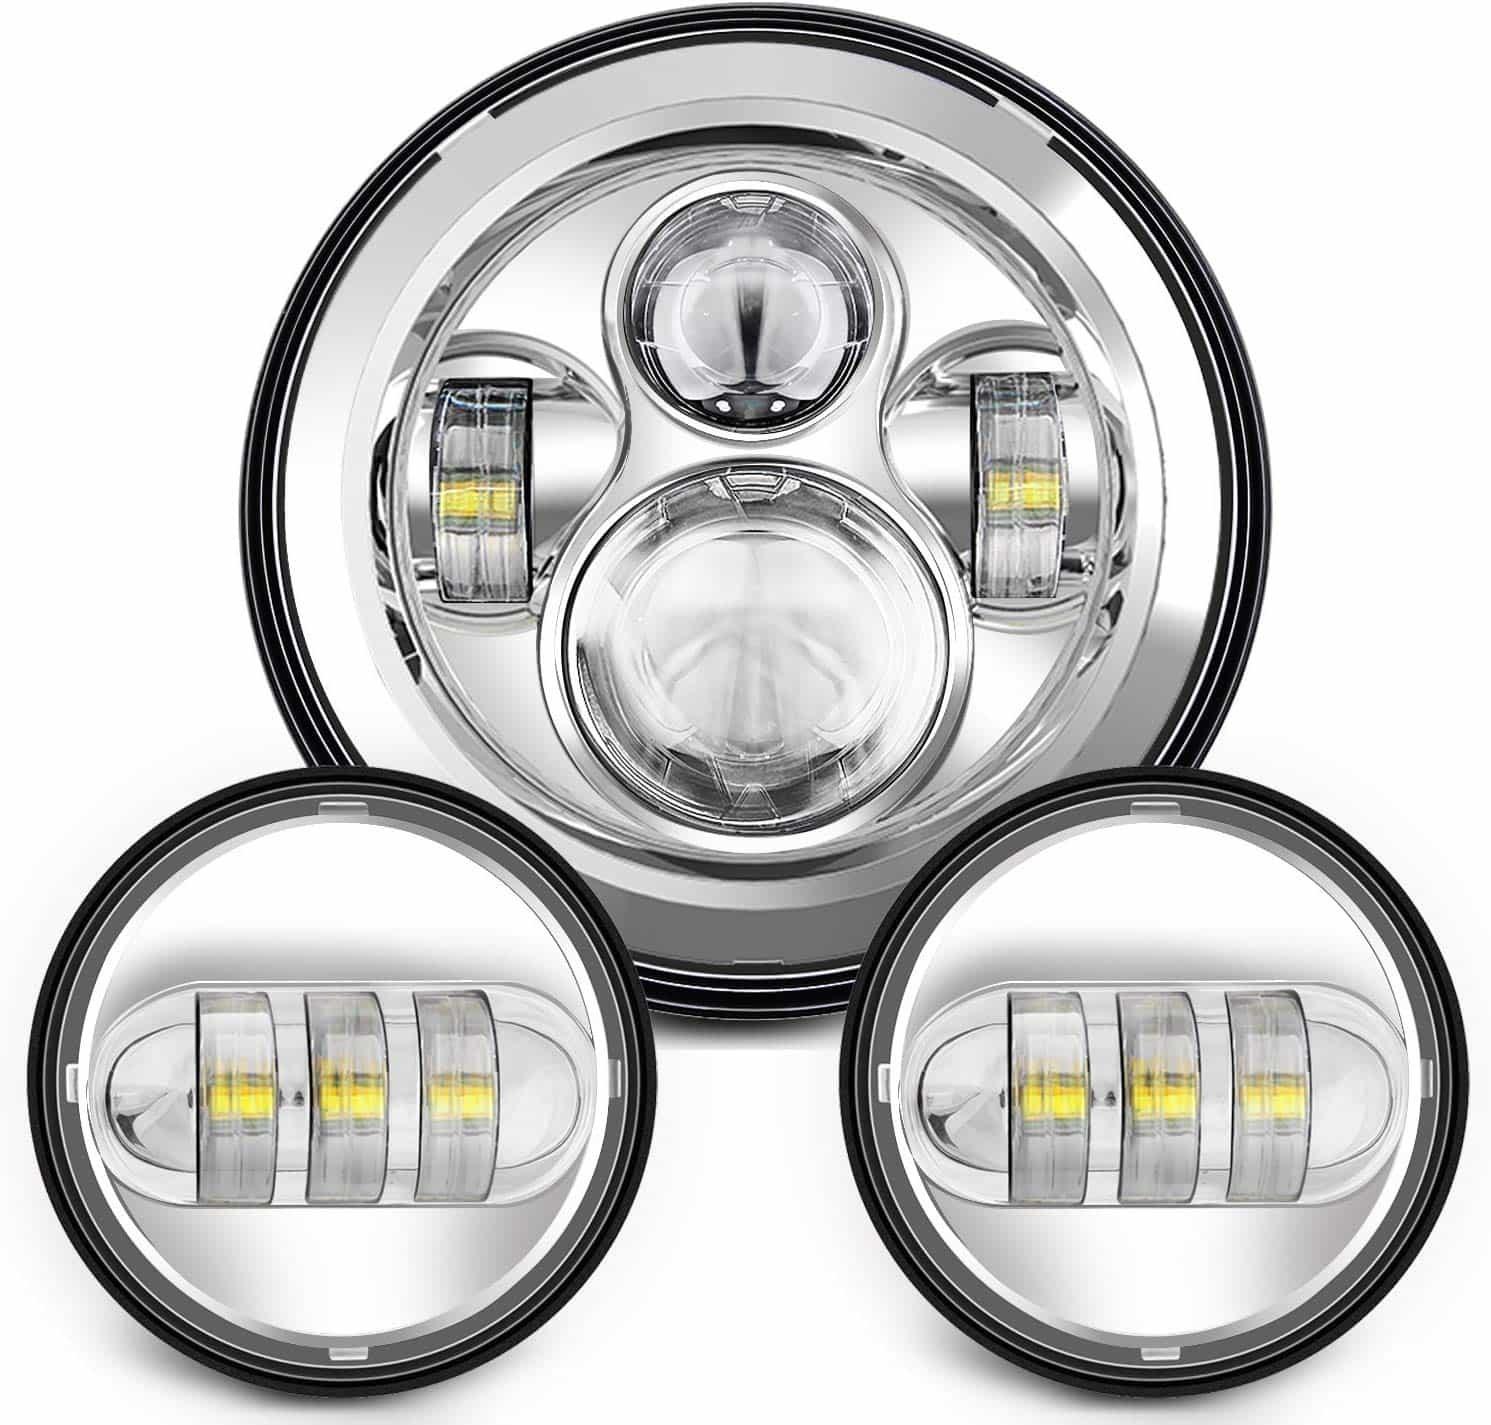 Sunpie_7_Inch_Chrome_Harley_LED_Headlight